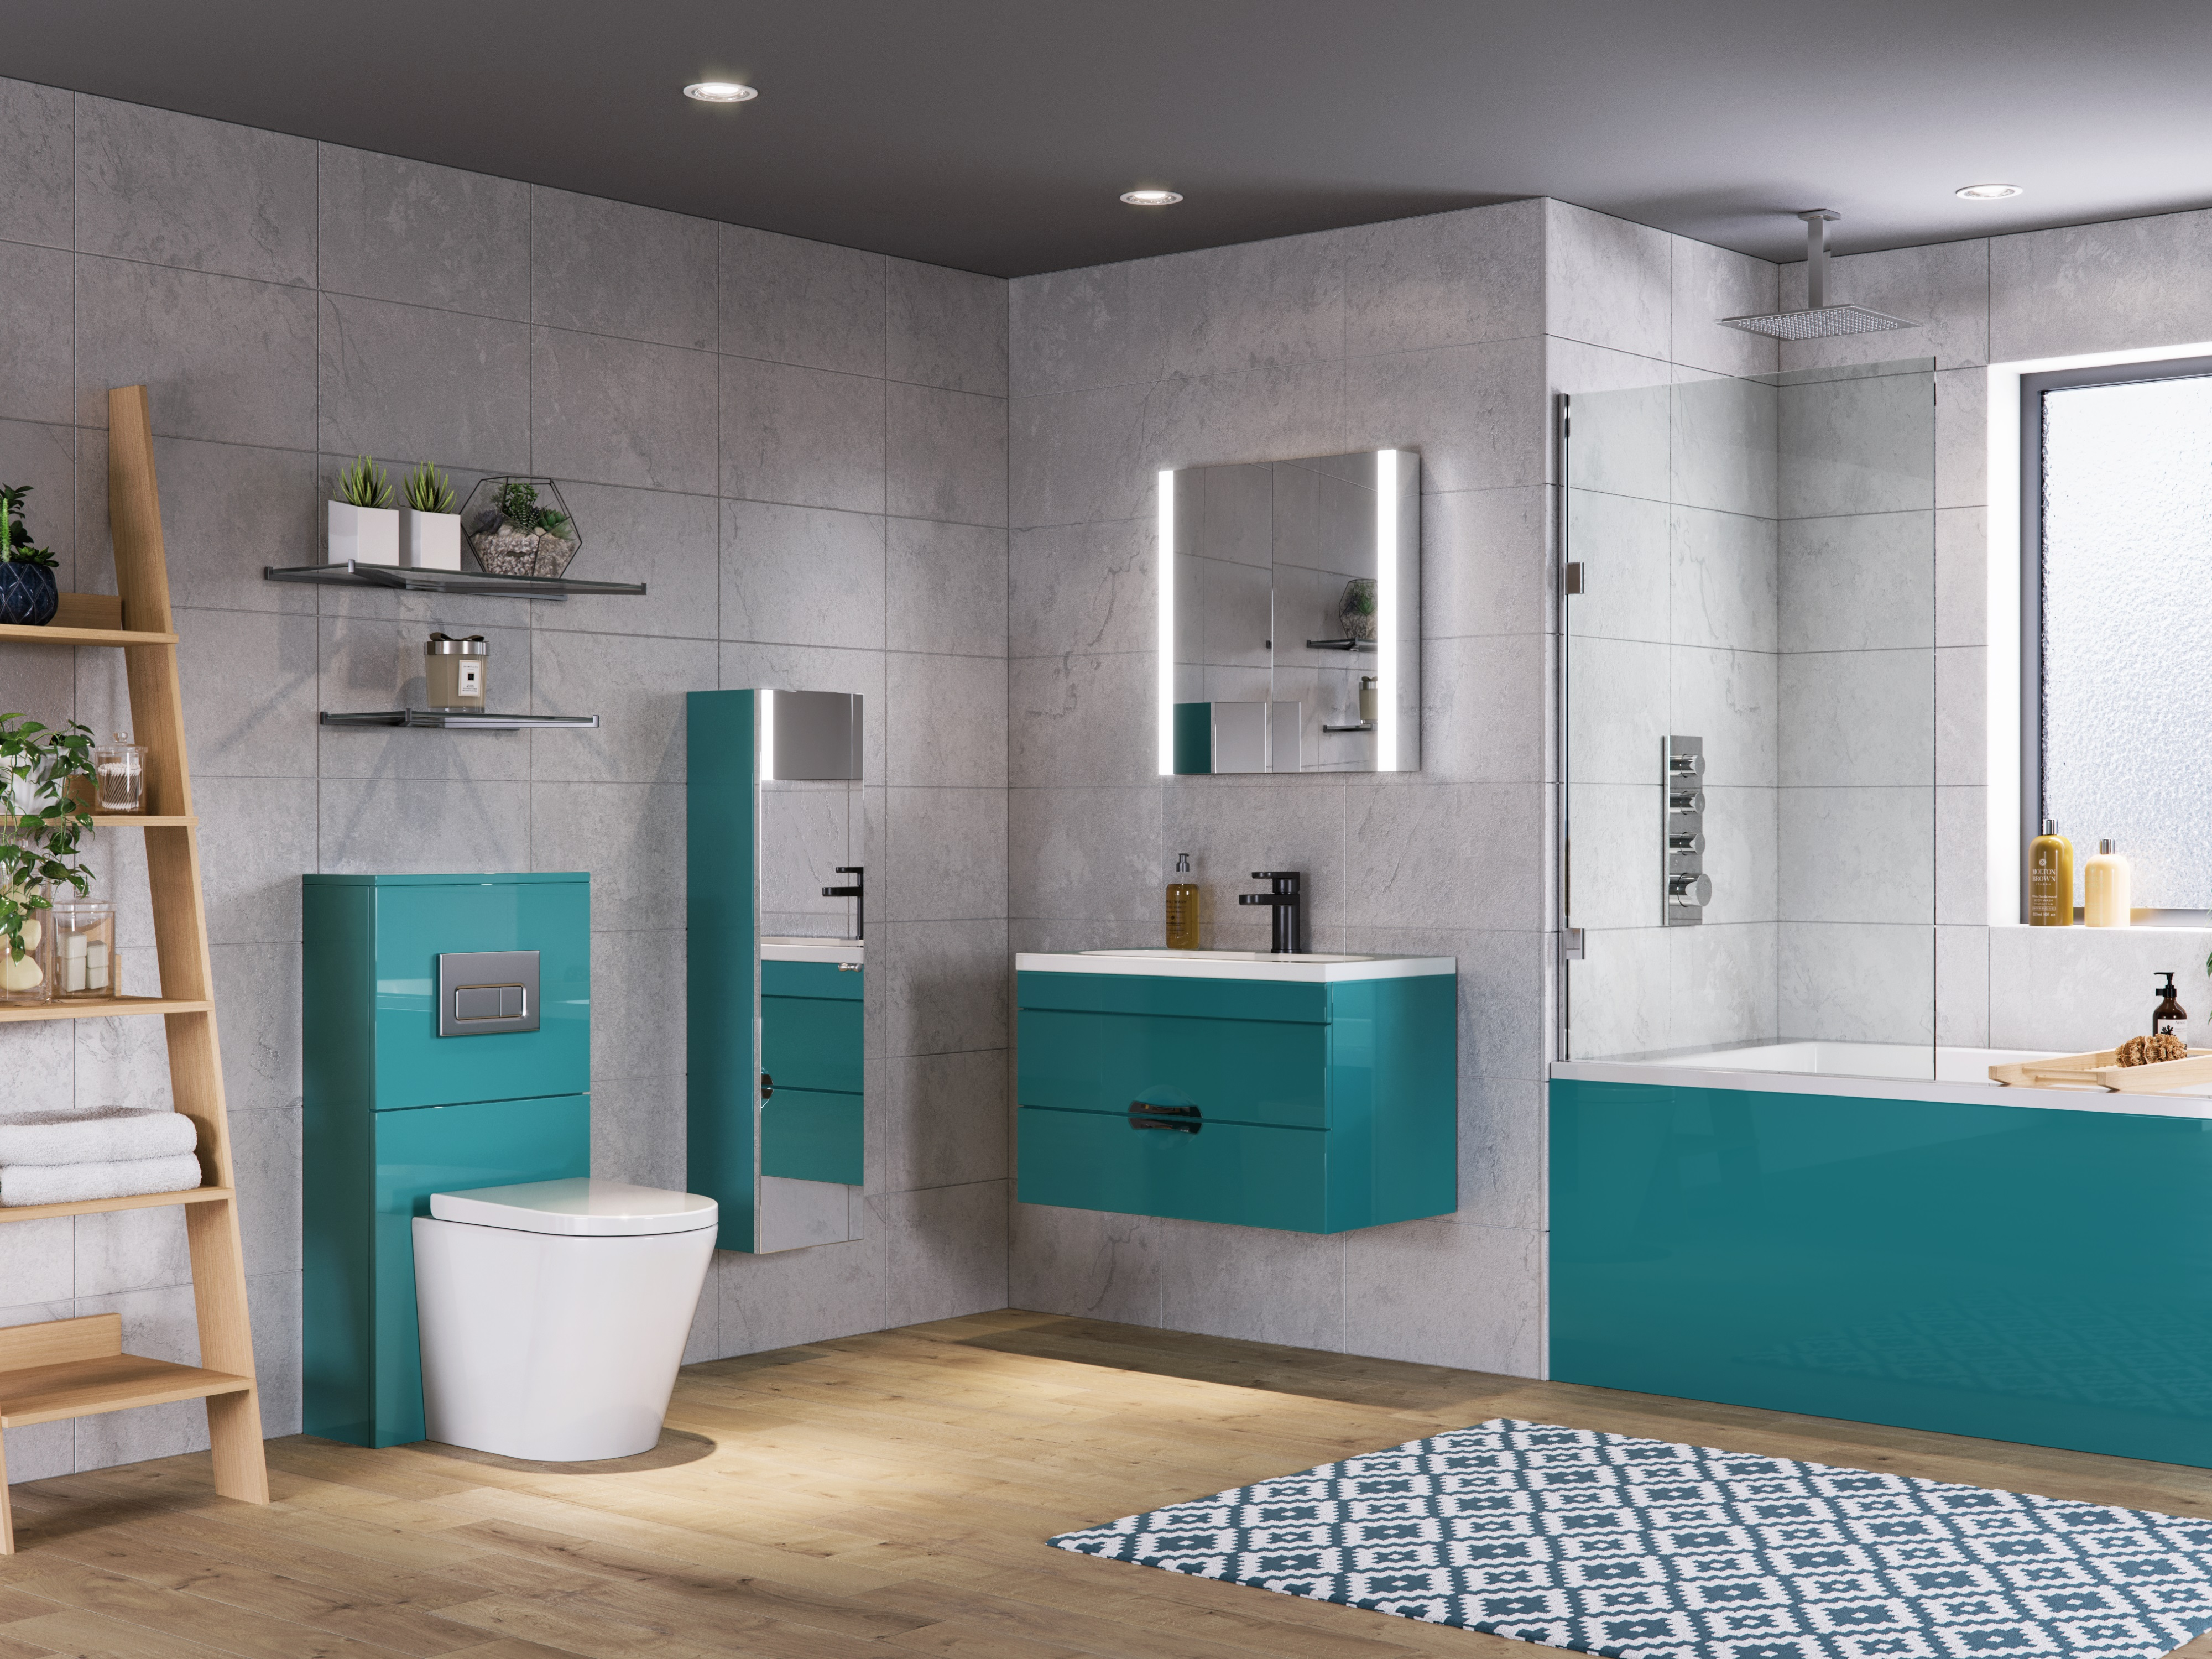 Family Bathroom Ideas: Designing Your Dream Bathroom  Homebuilding